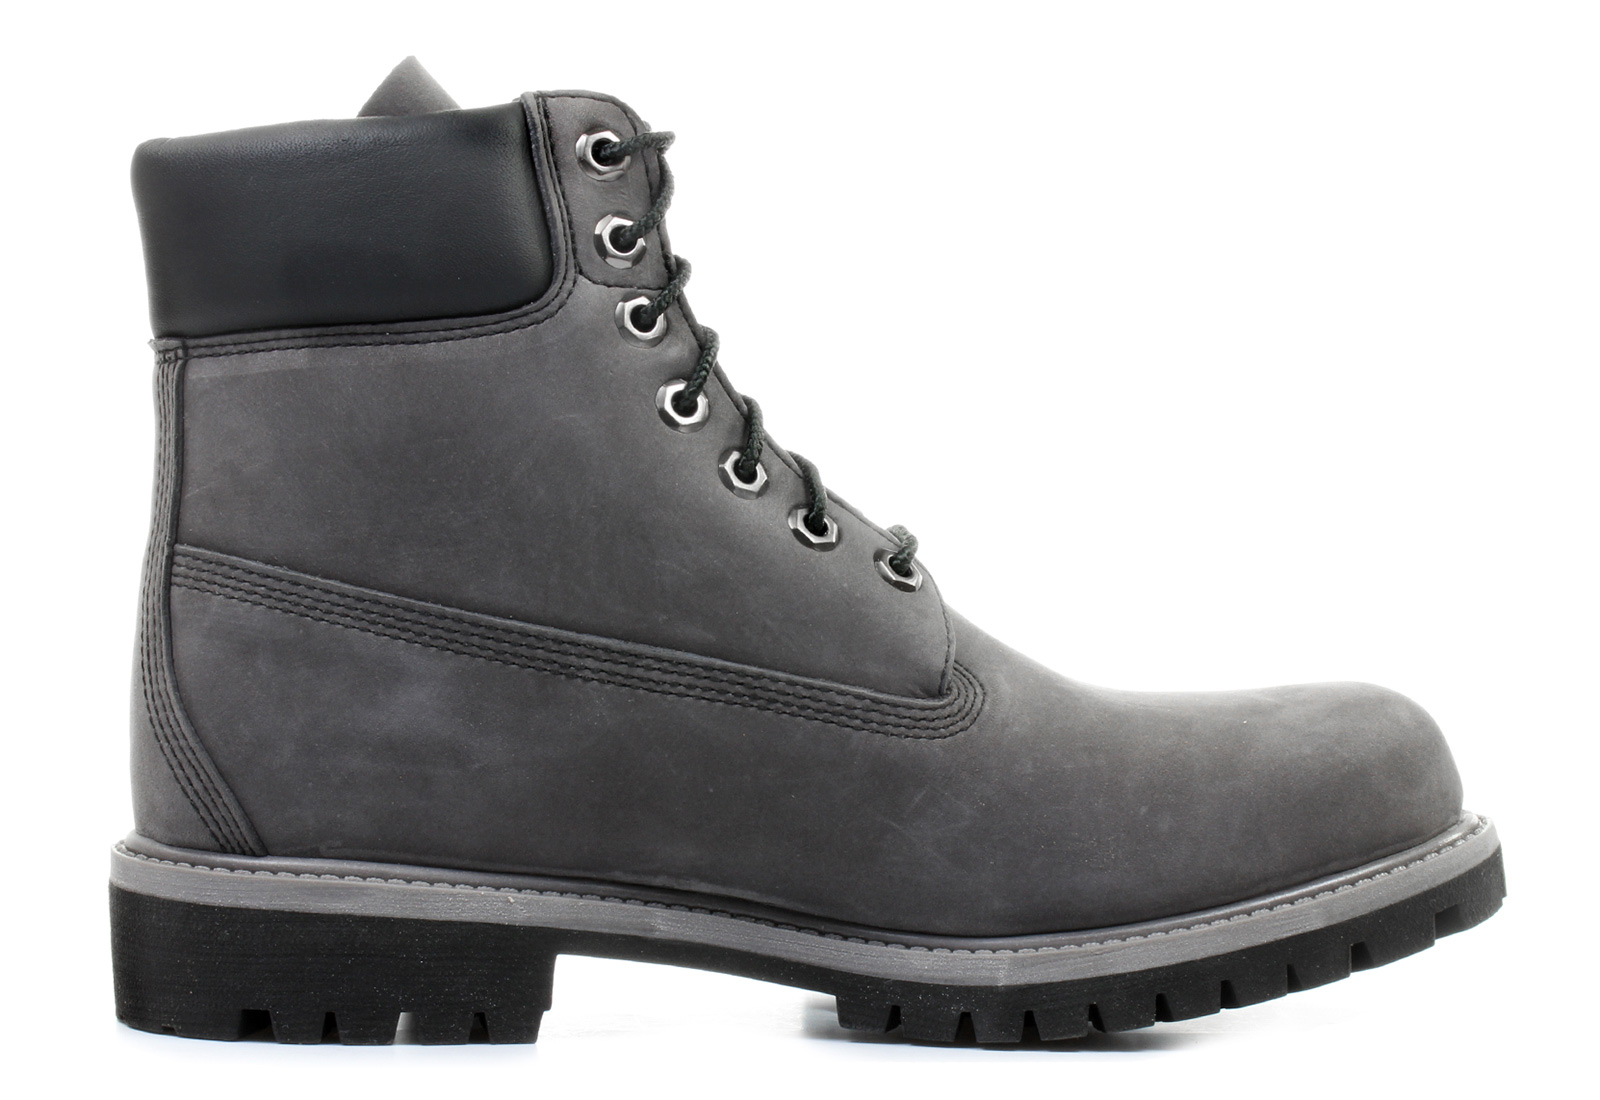 timberland men's boot 6 inch premium 6609a grey black